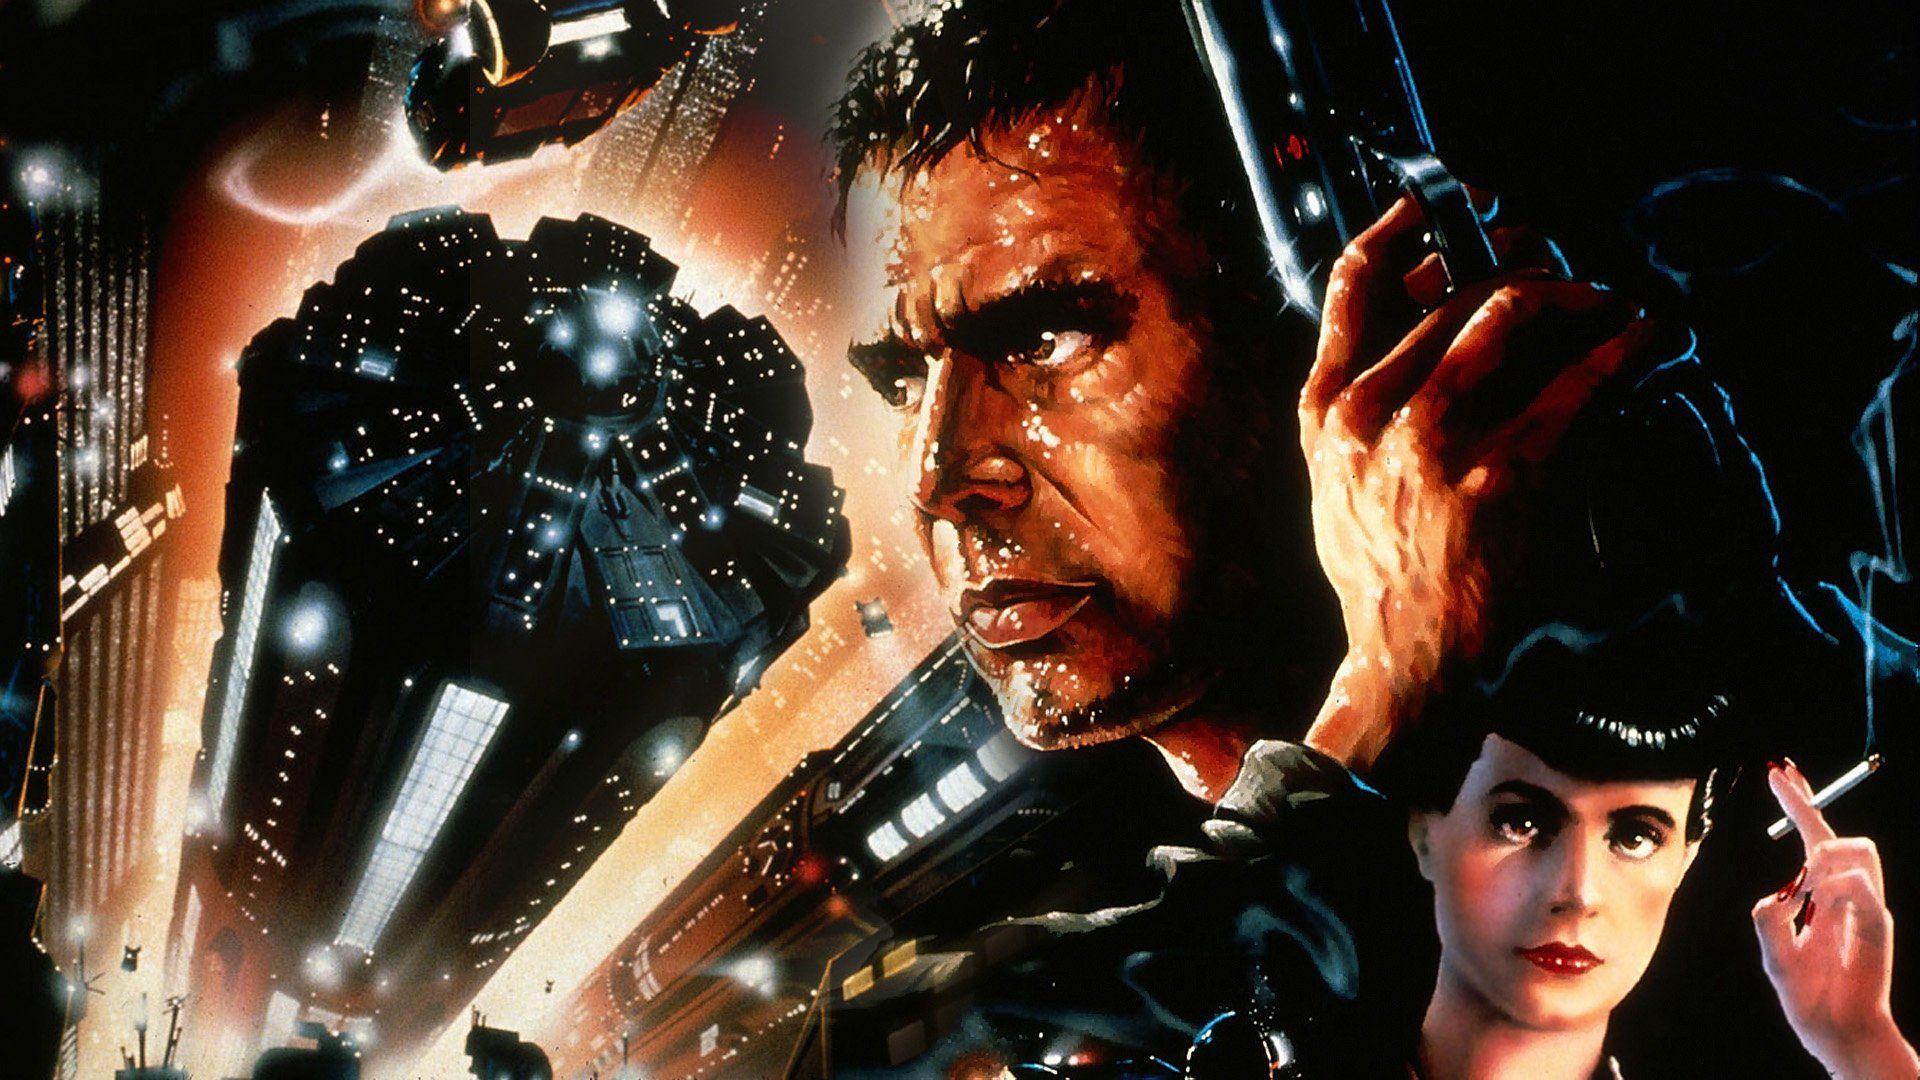 67 Blade Runner Hd Wallpapers Backgrounds Wallpaper Abyss Blade Runner Blade Runner Wallpaper Blade Runner 2049